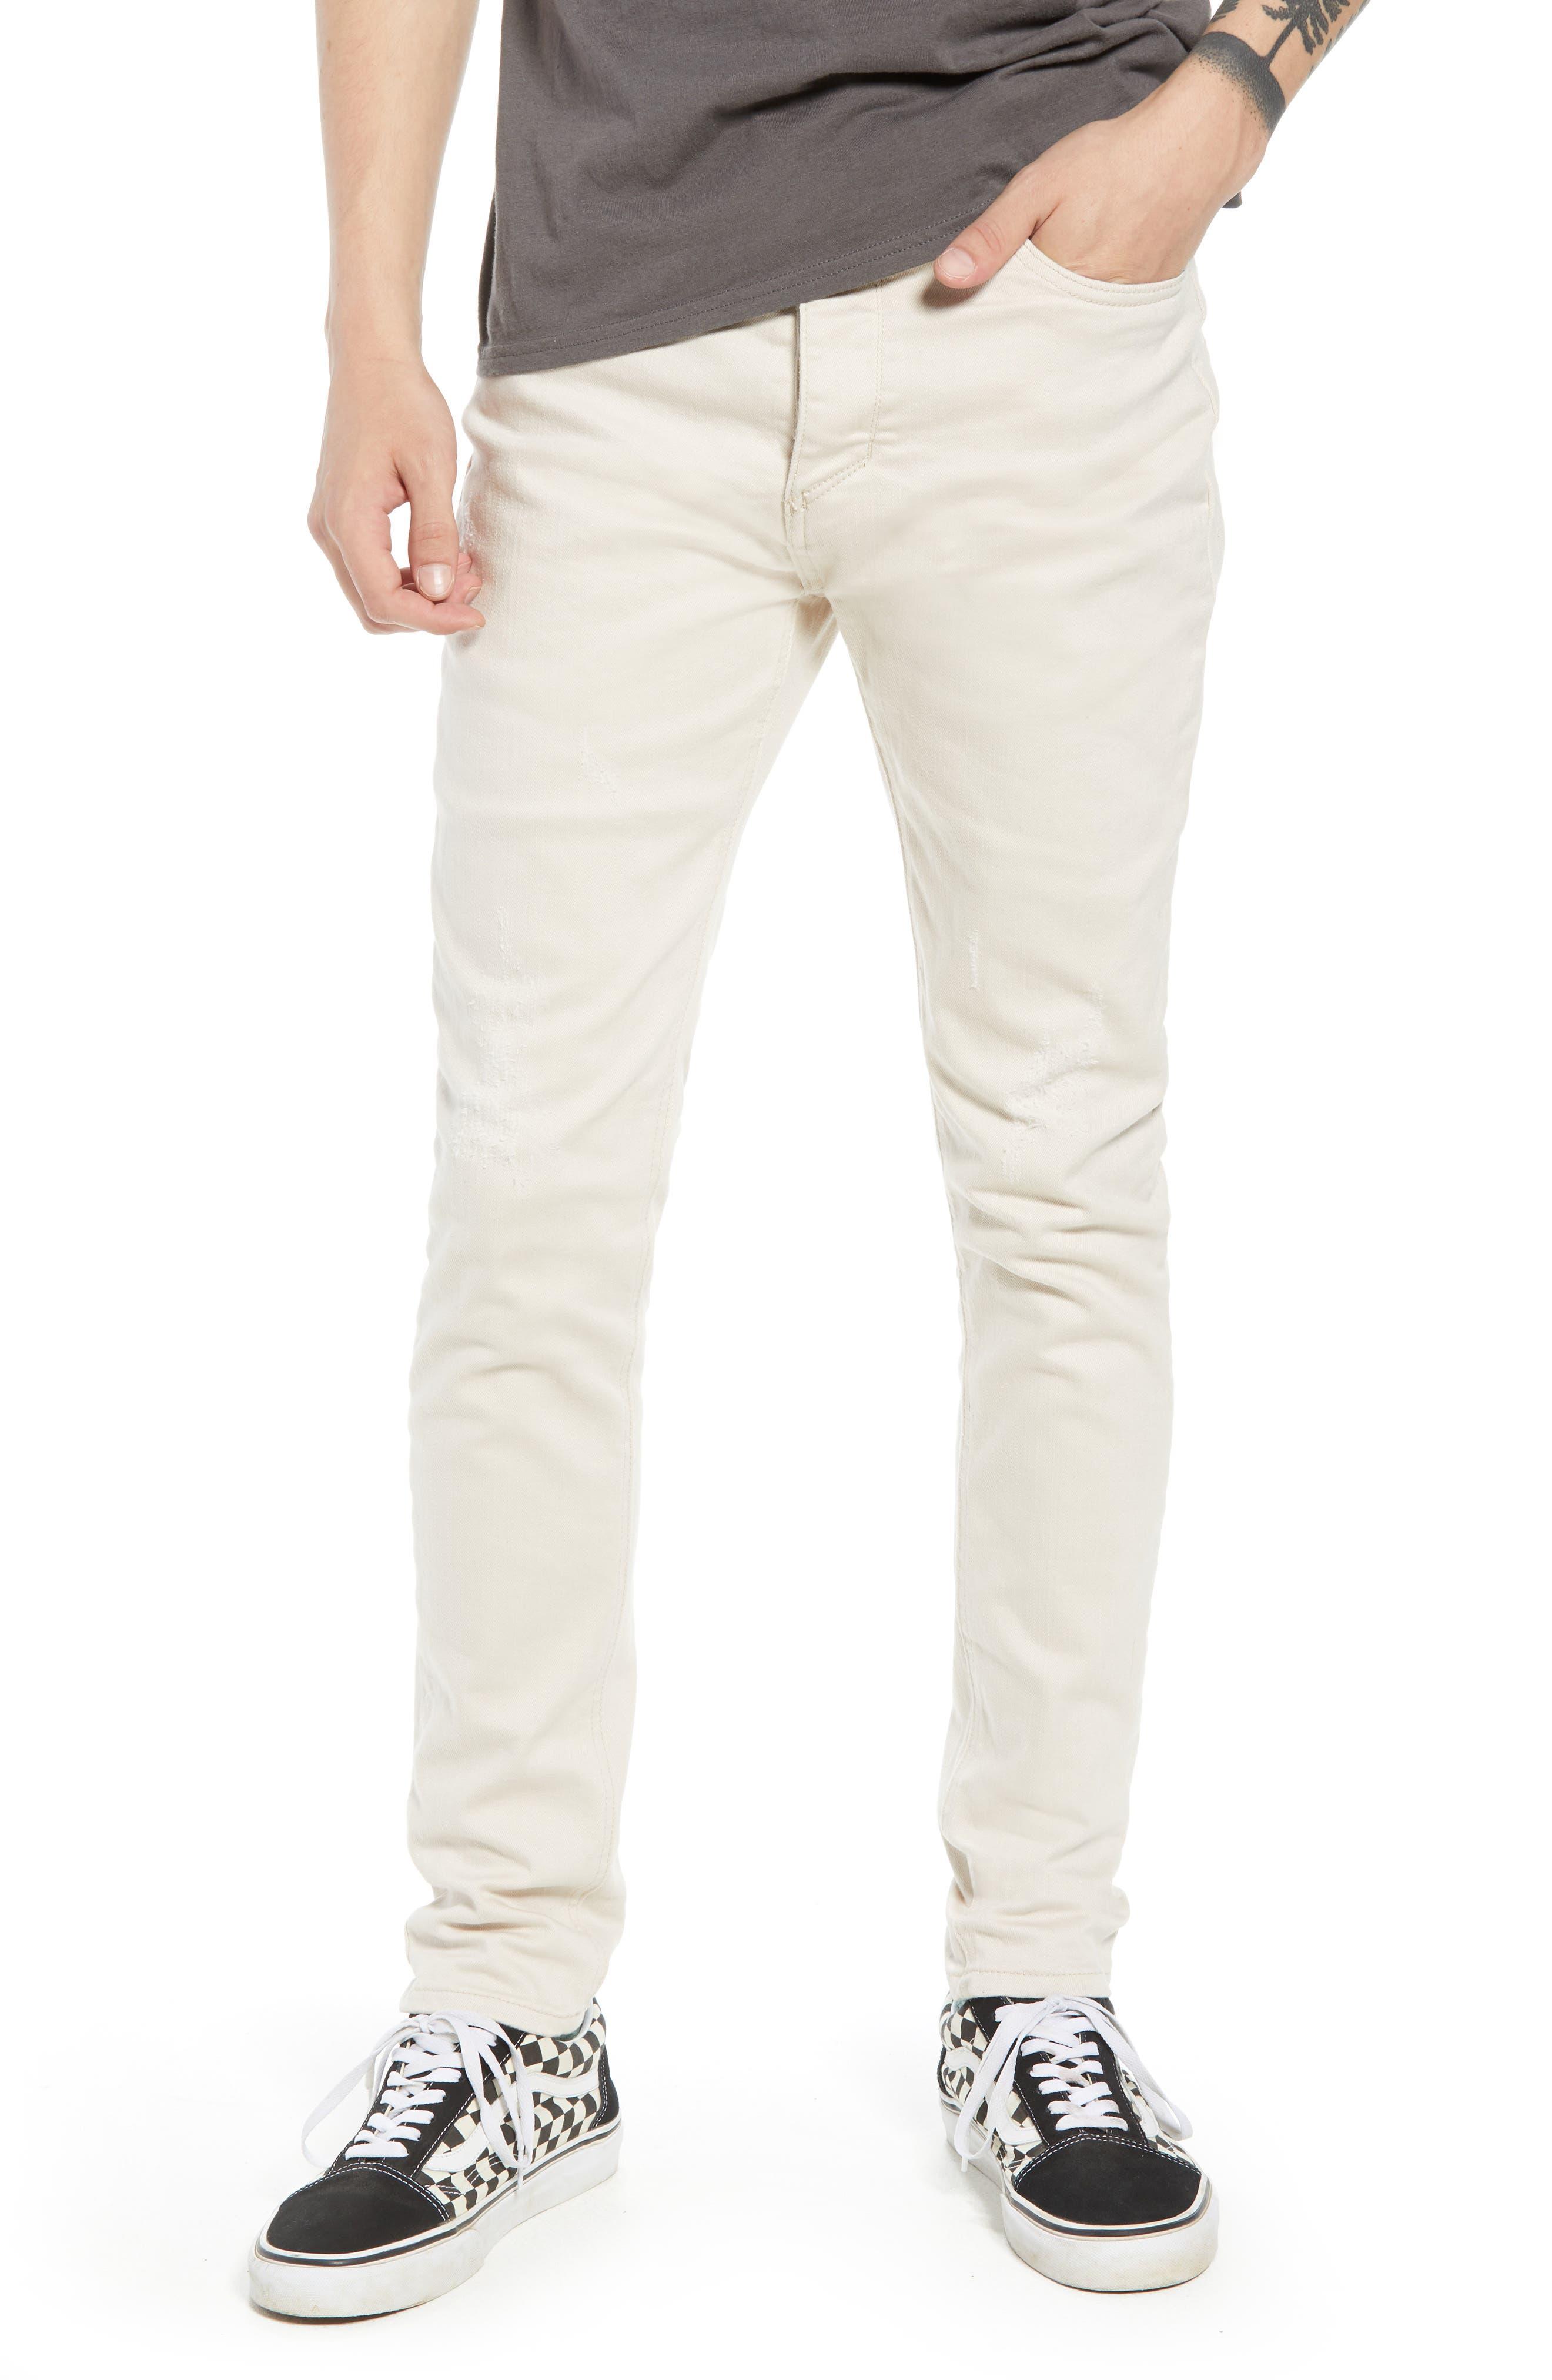 Joe Blow Slim Fit Jeans,                             Main thumbnail 1, color,                             901